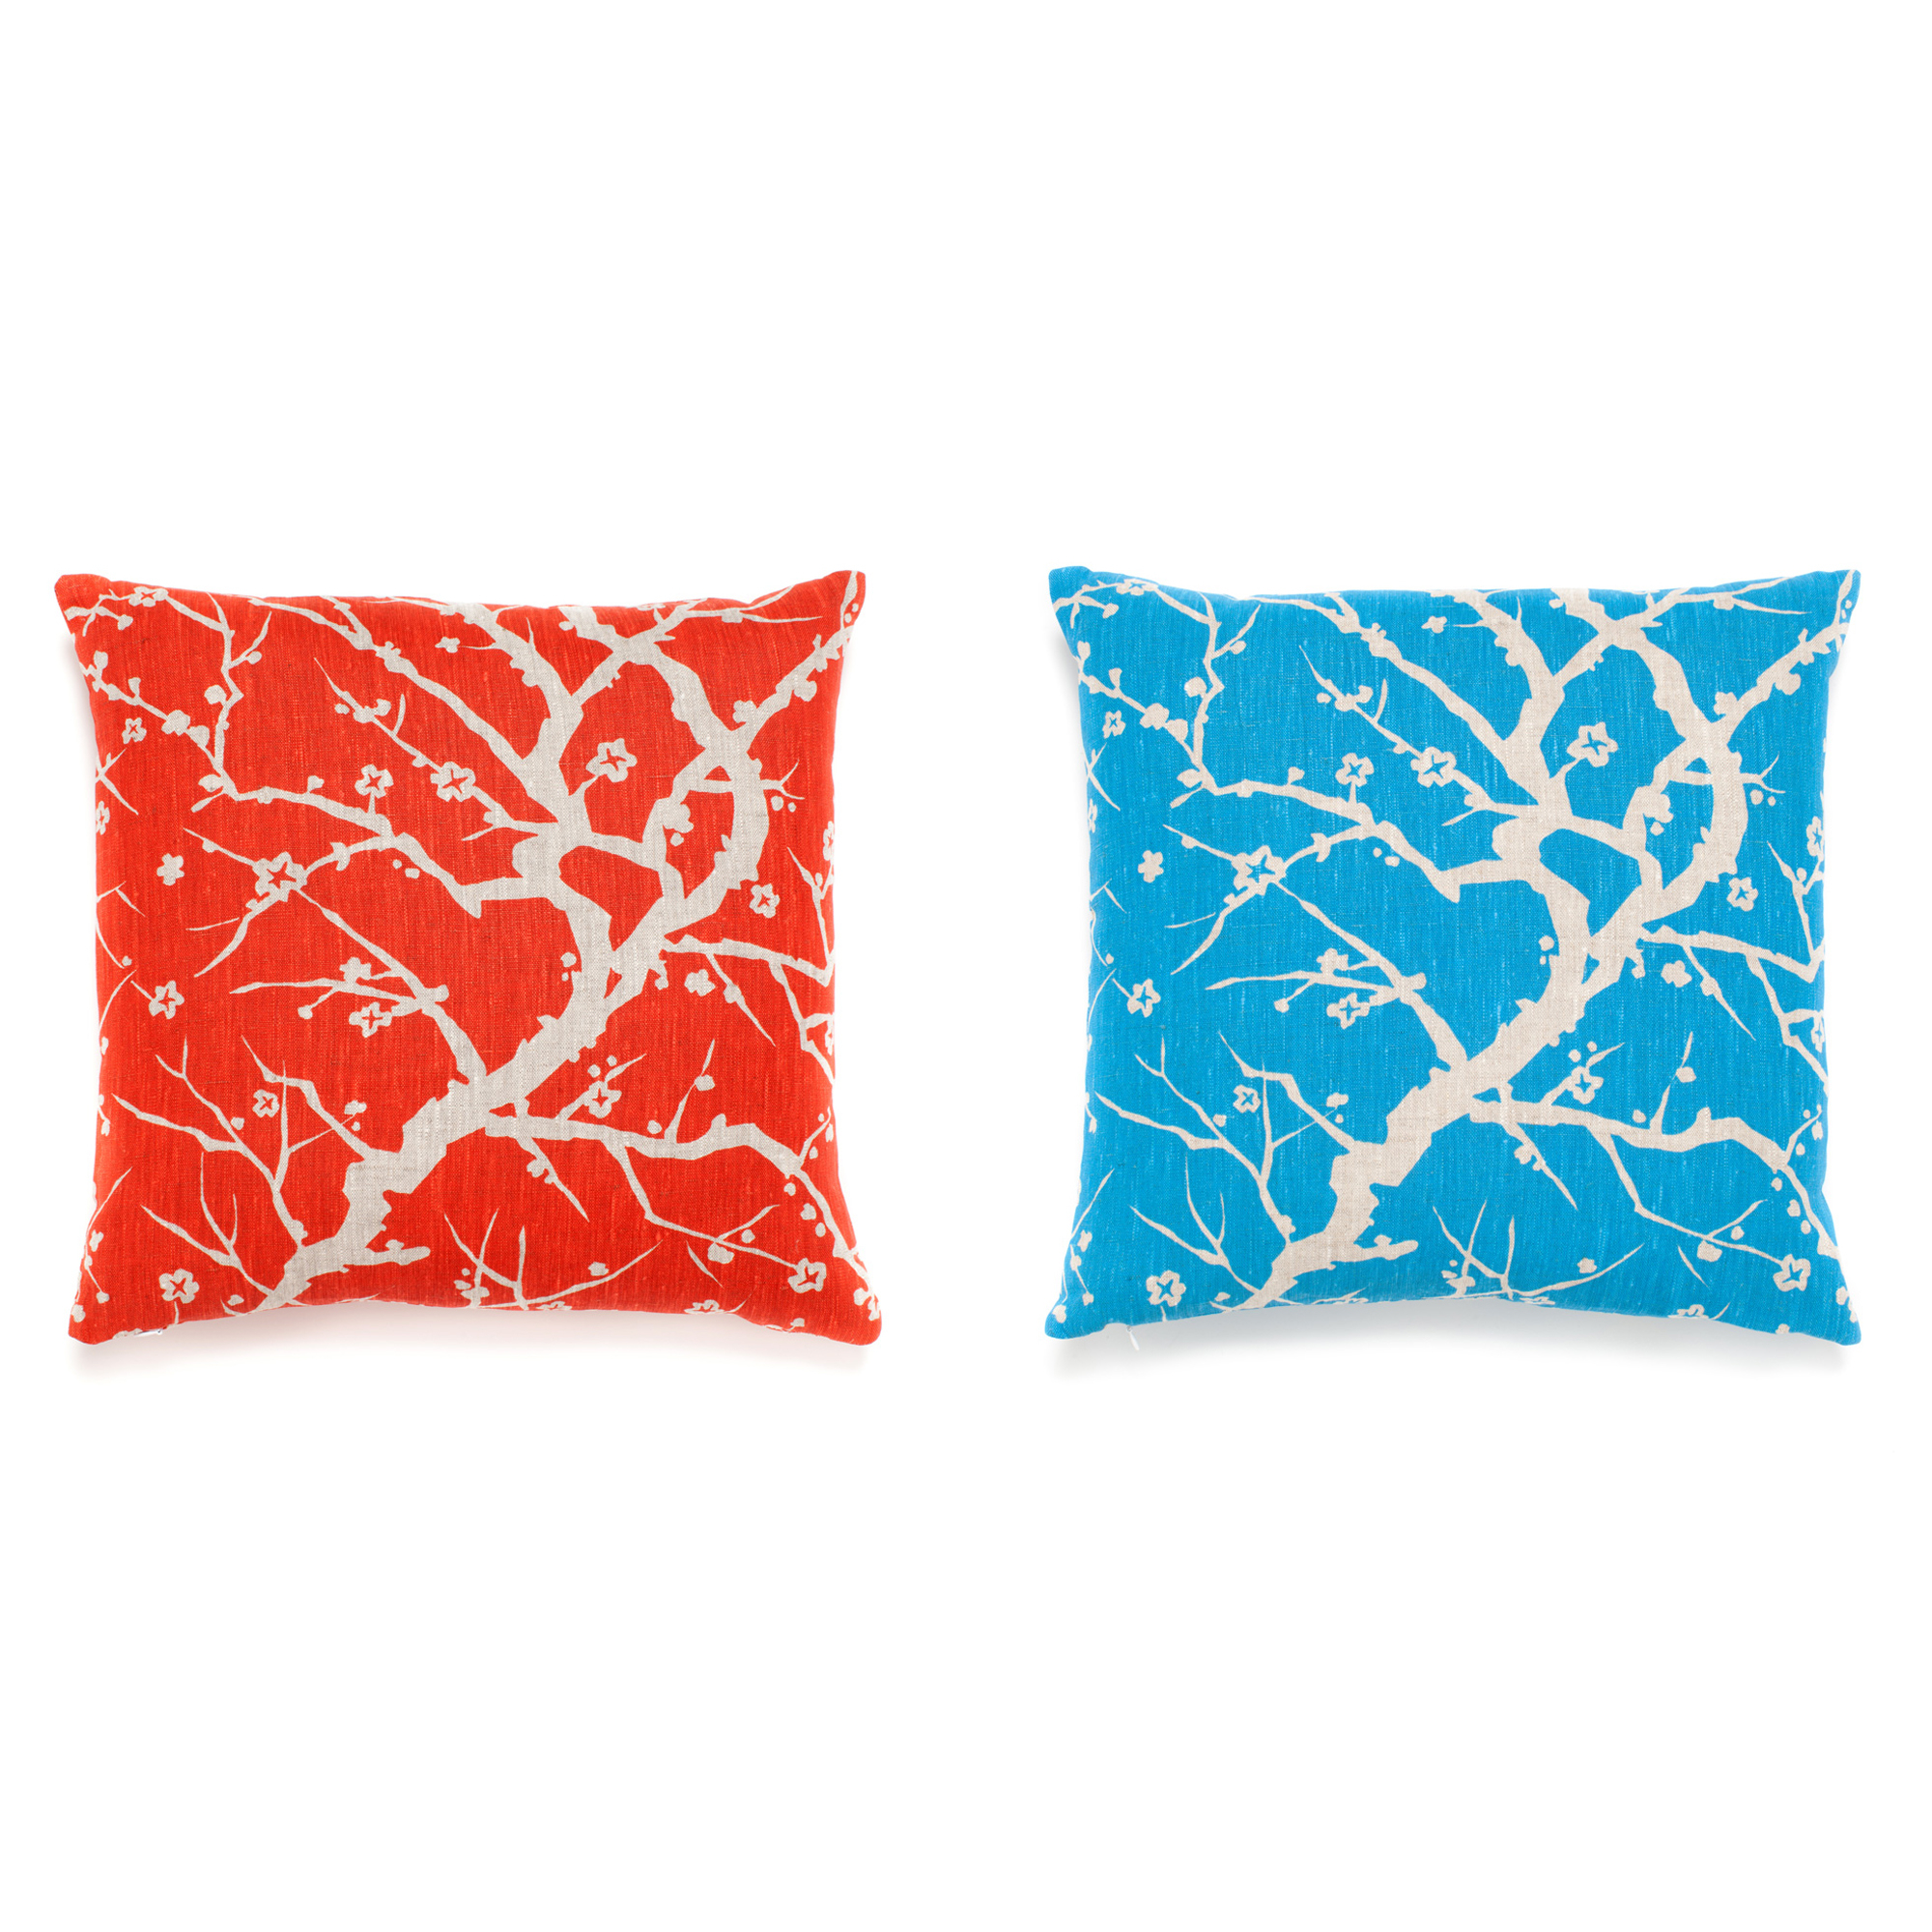 Throw Pillows Home : Cherry Blossom Branch Pillows Gump s